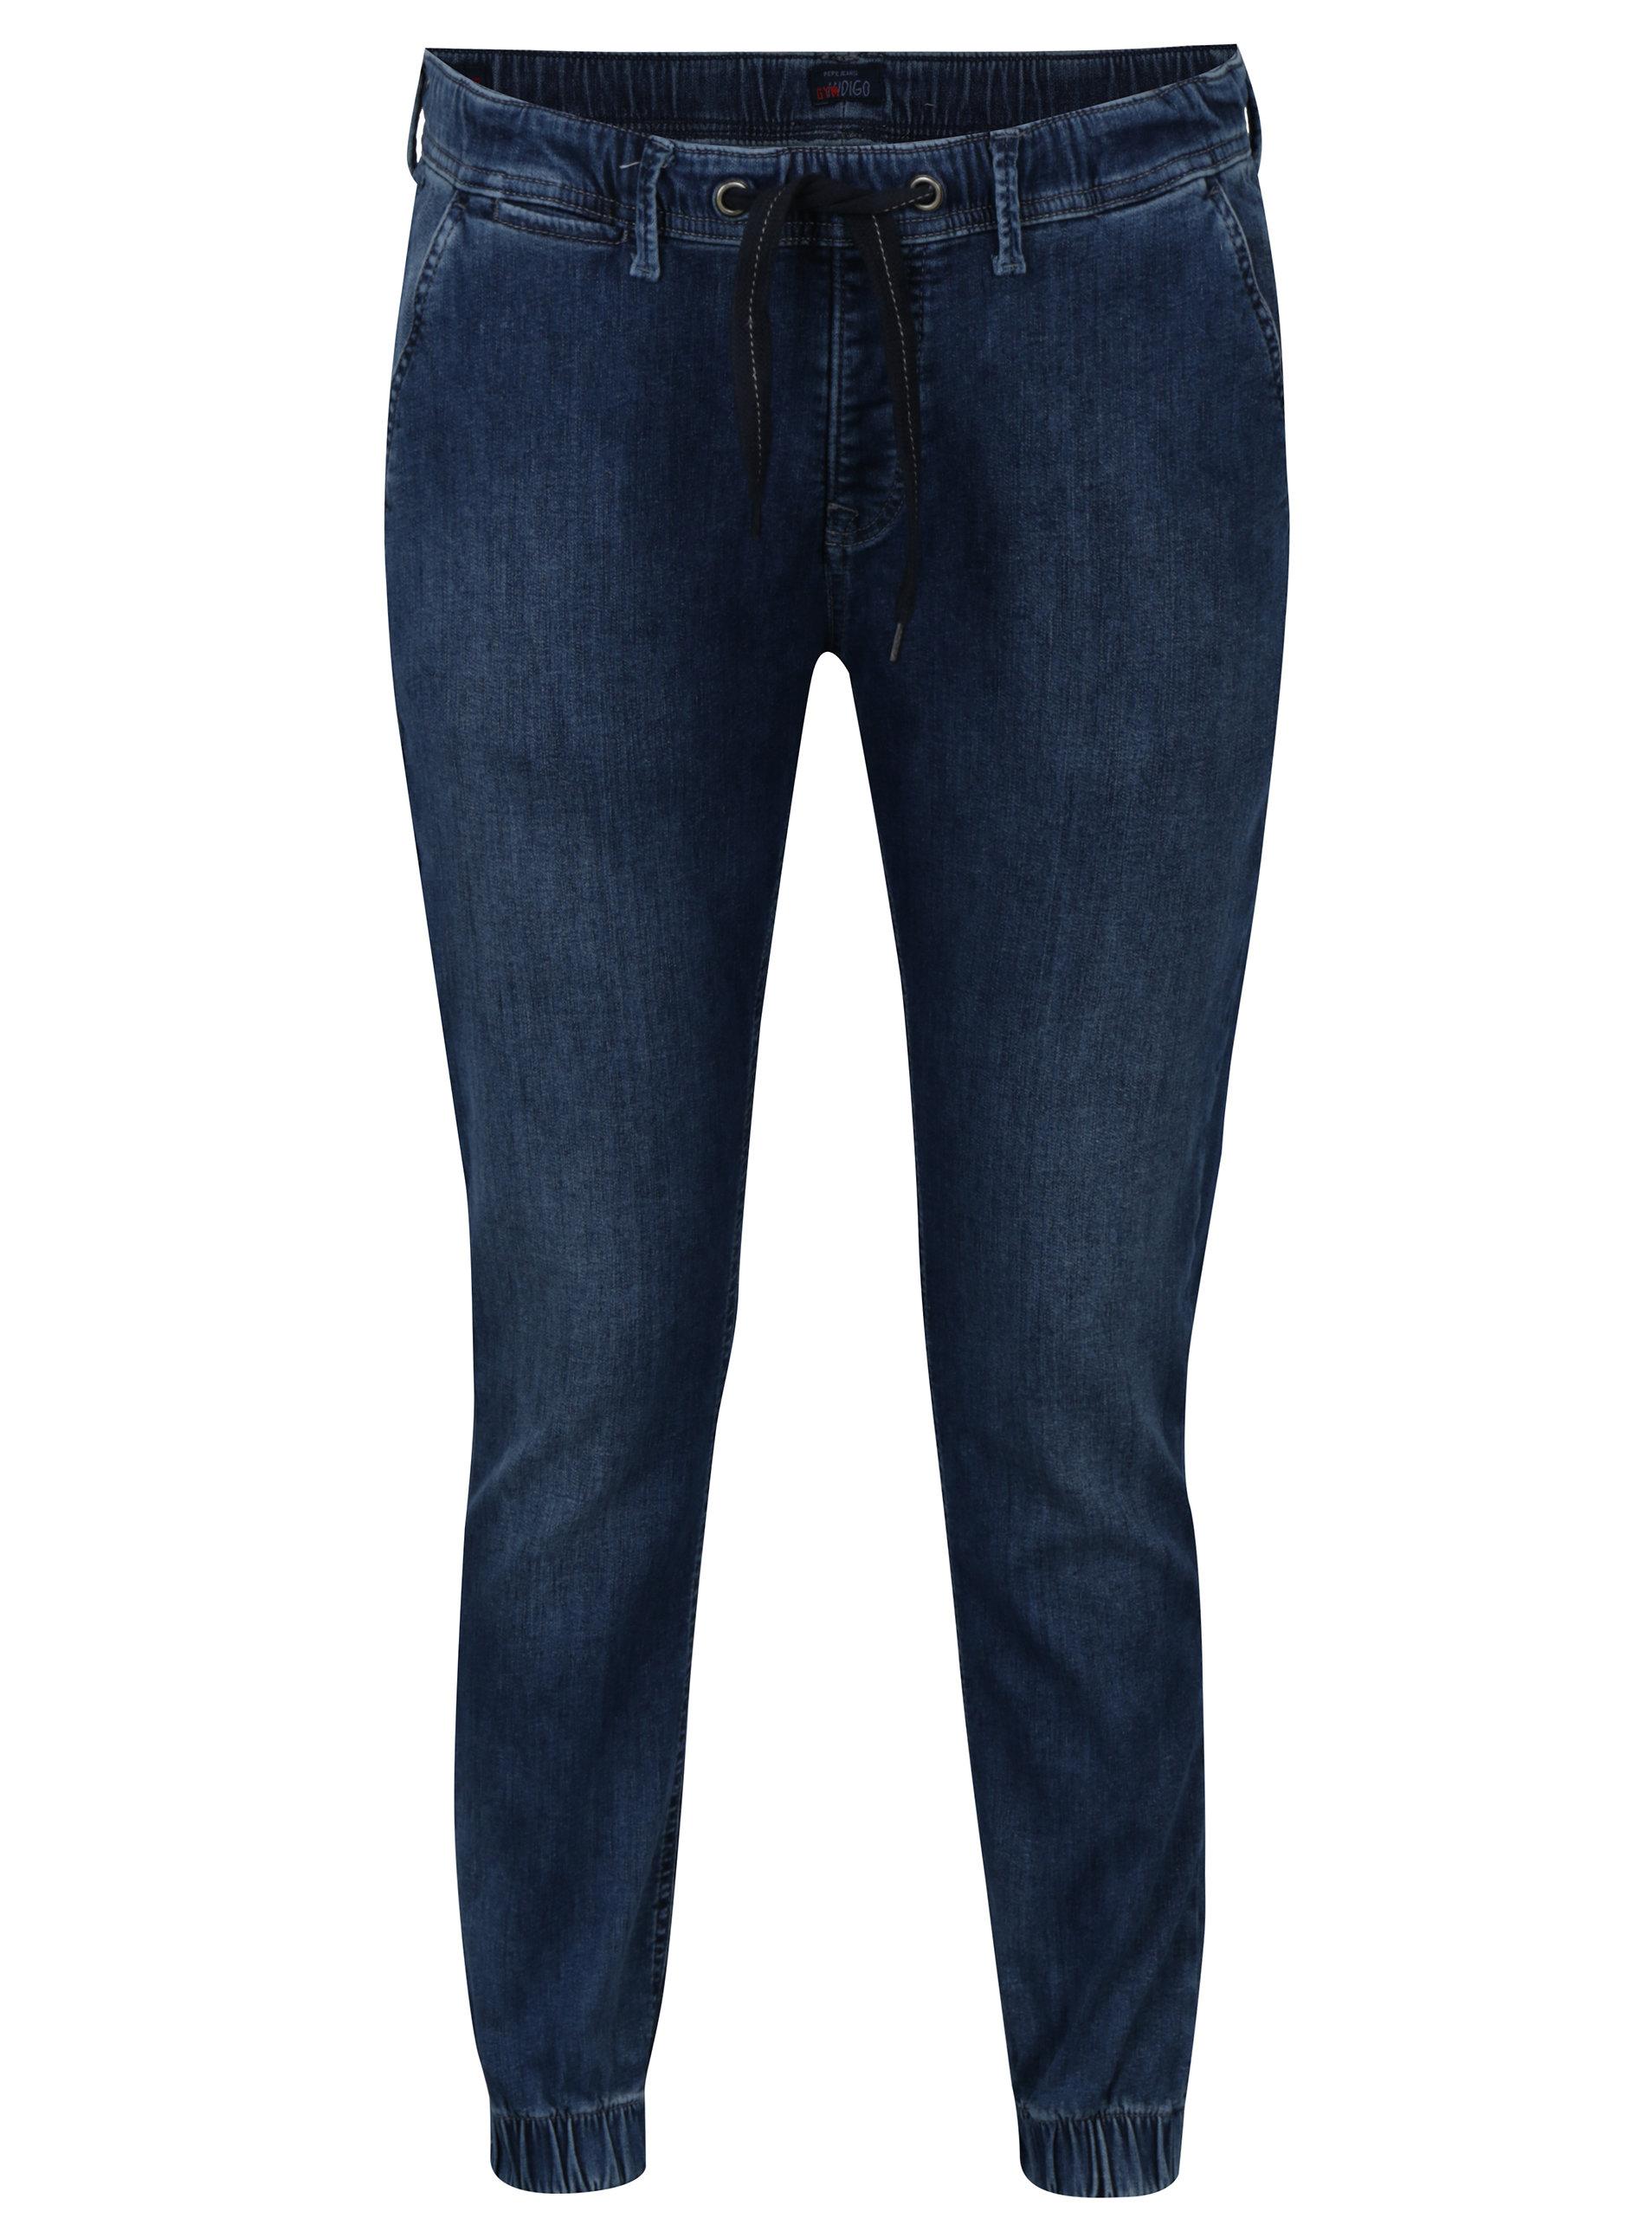 a93e88d14c5e Modré dámské džínové jogger kalhoty Pepe Jeans Cosie ...